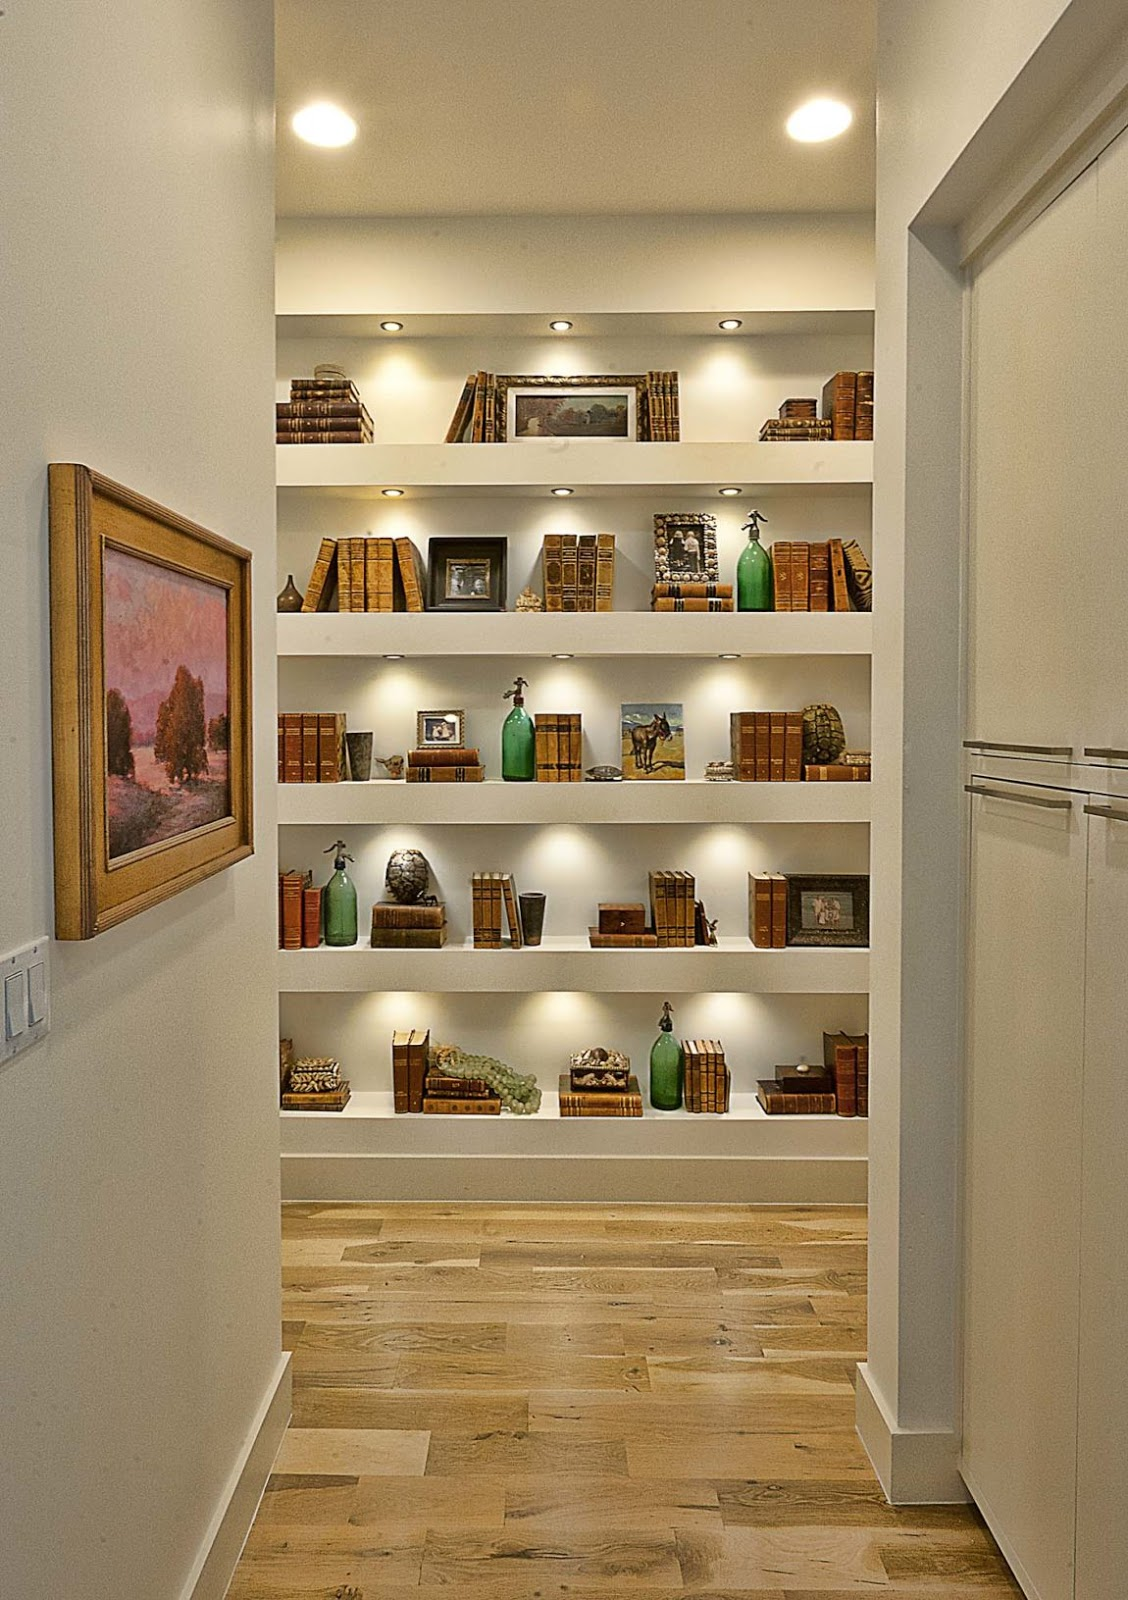 50 beautiful wall shelf designs and lighting ideas decor - Bedroom wall shelves decorating ideas ...